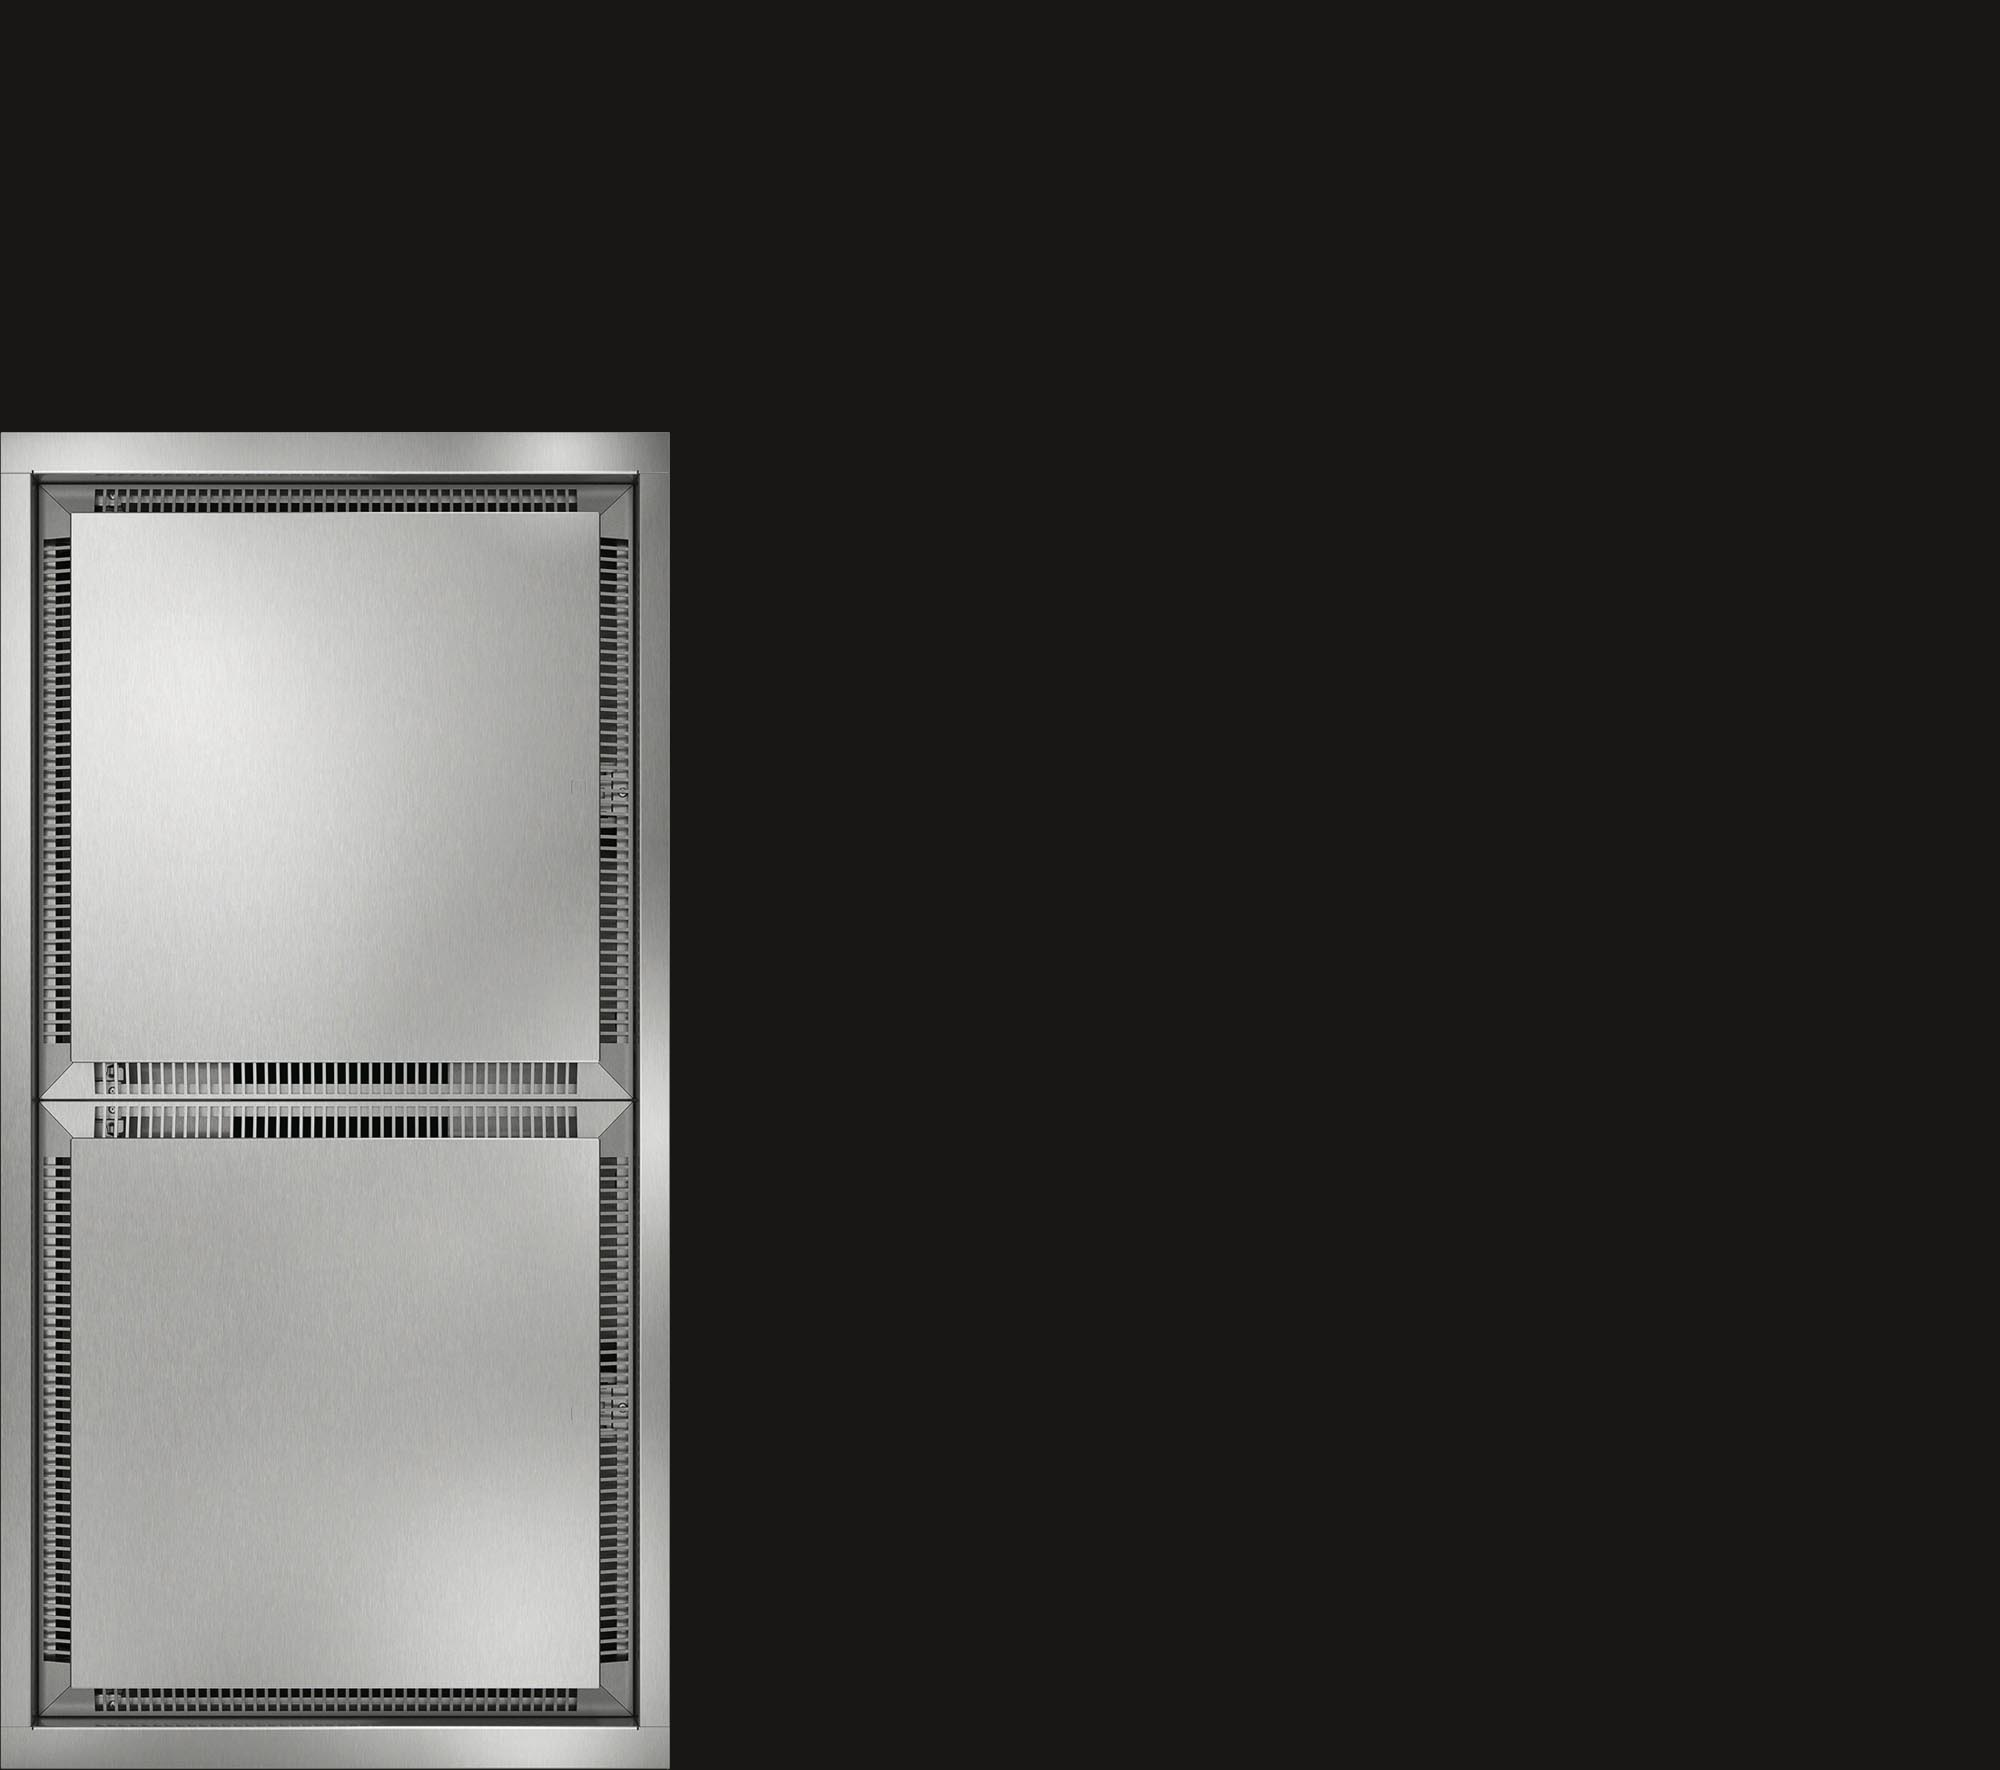 Витяжка для монтажу у стелю AC402181 GAGGENAU